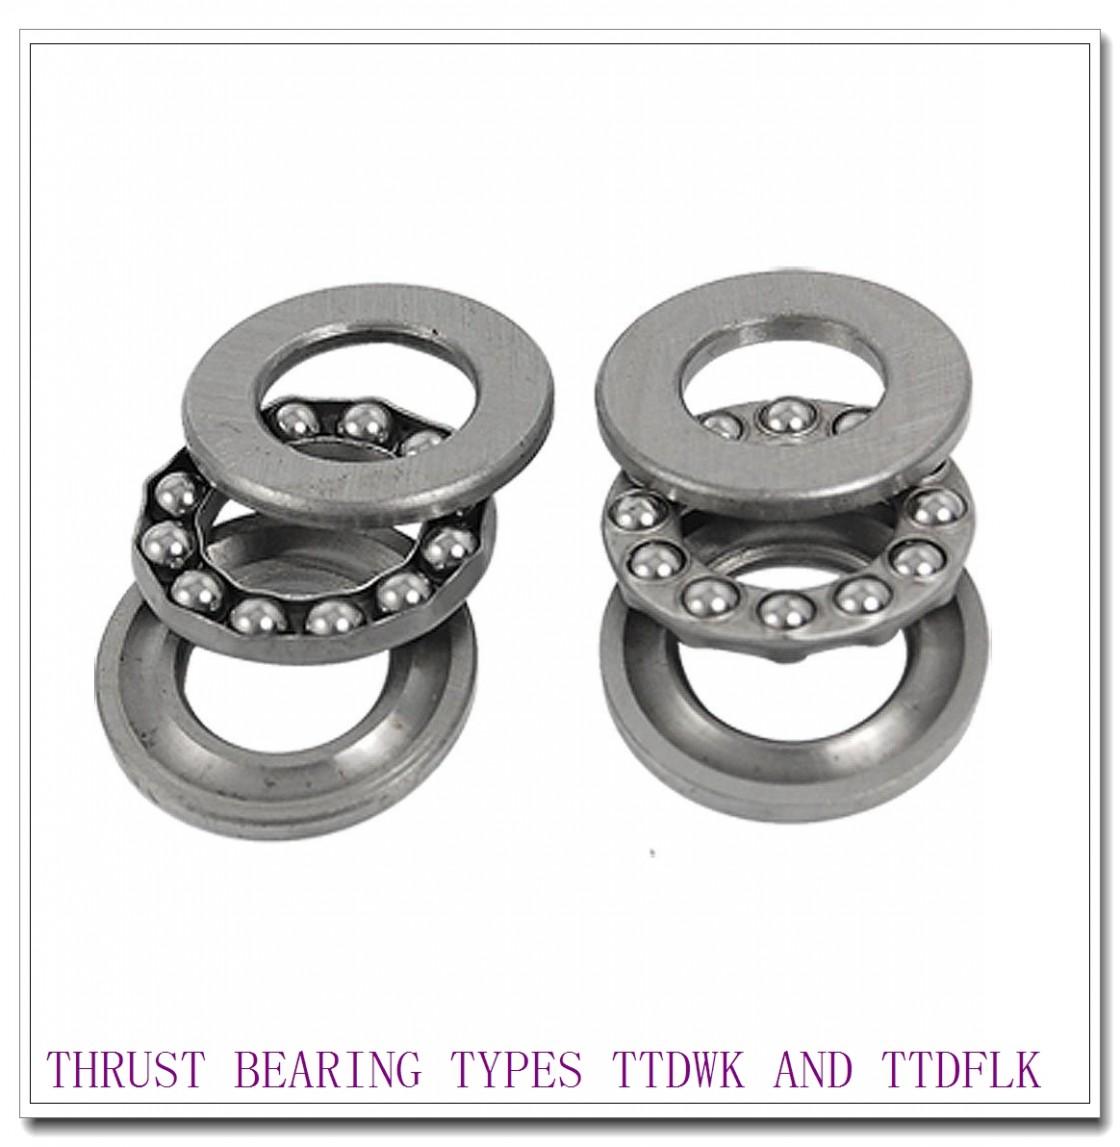 T10400F THRUST BEARING TYPES TTDWK AND TTDFLK